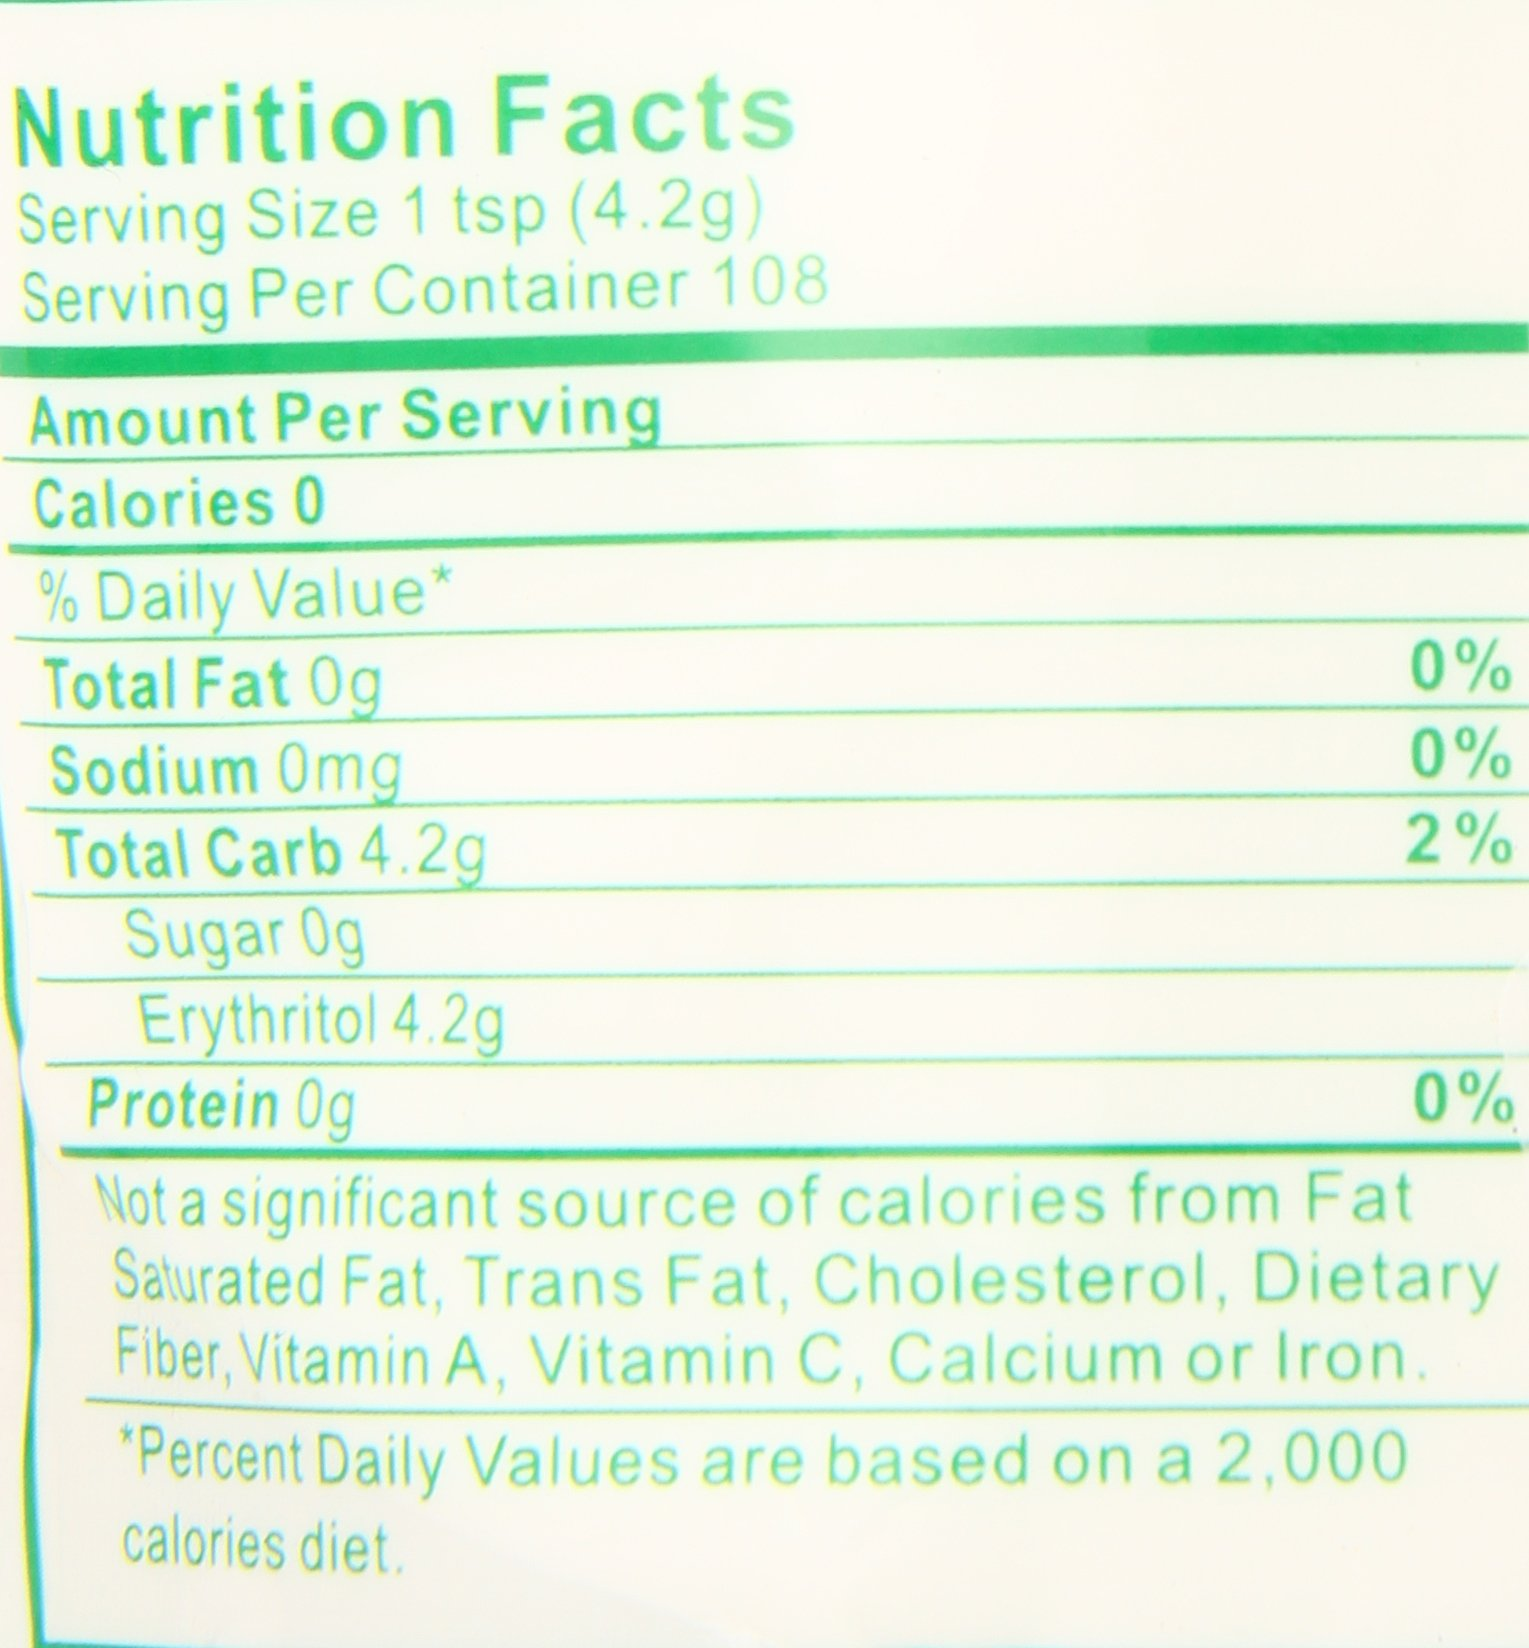 Natural Mate Stevia All Purpose Natural Sweetener, 1 lb by Natural Mate (Image #3)